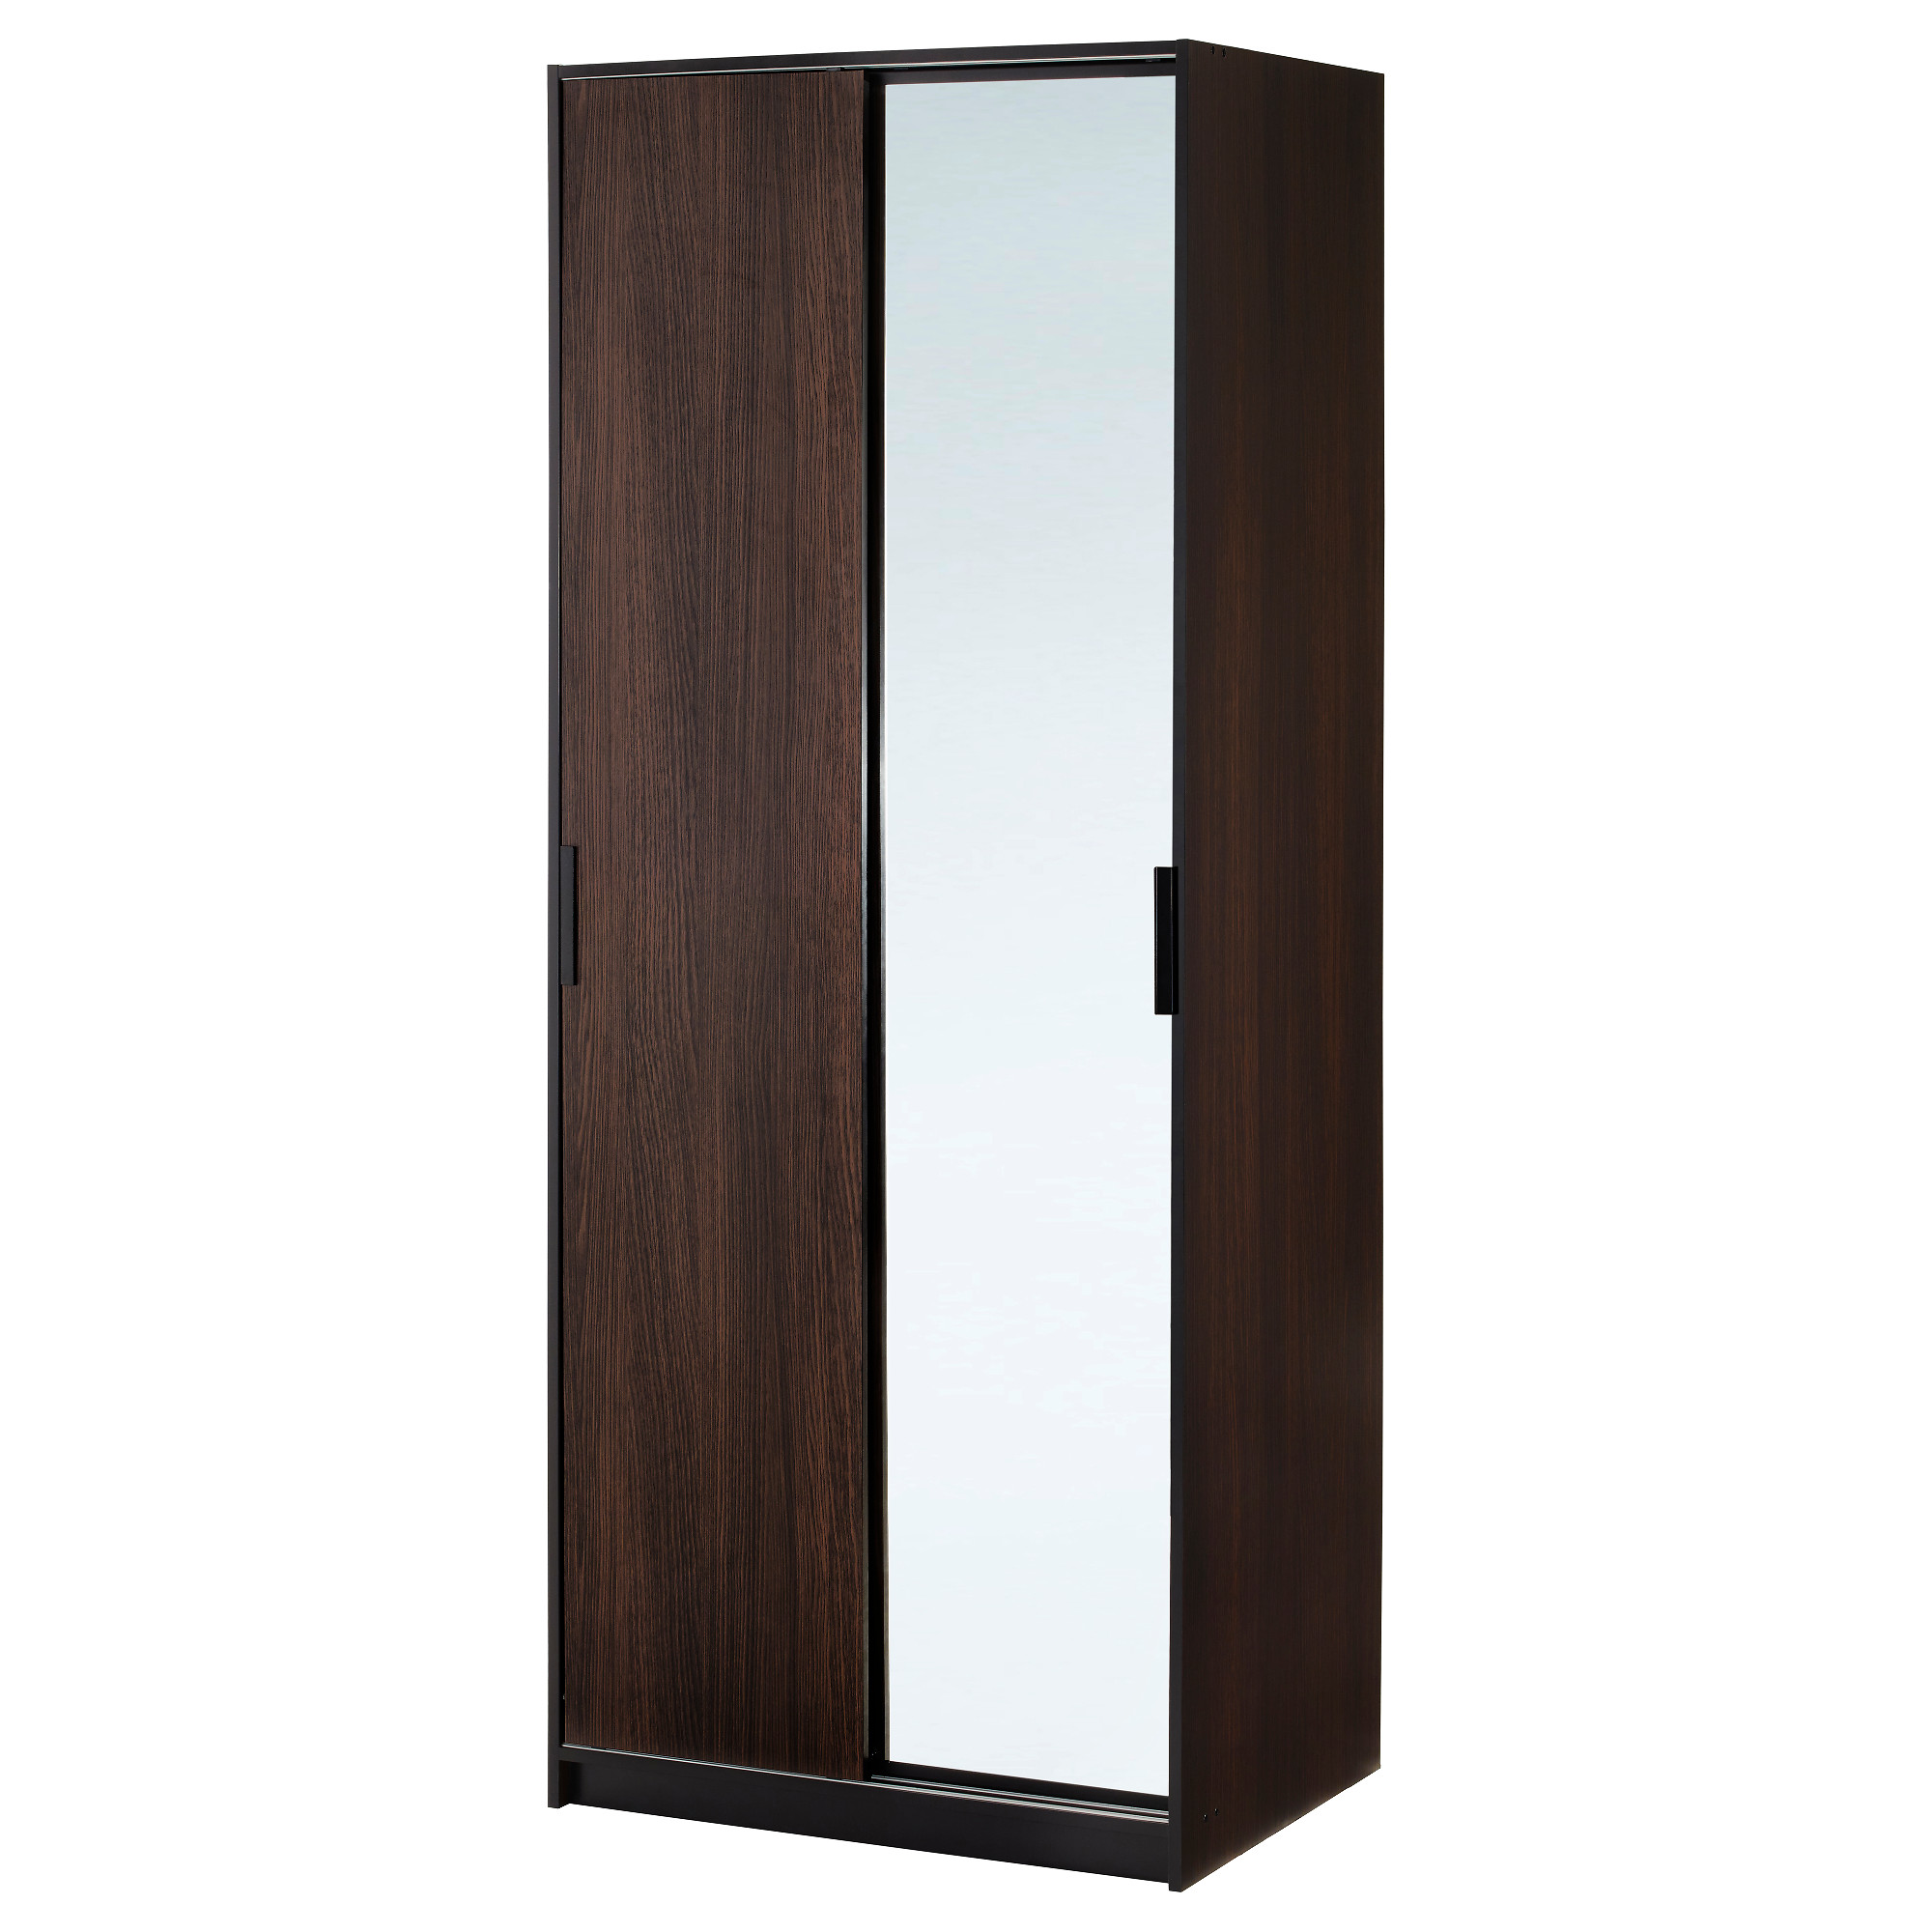 Unique TRYSIL wardrobe, dark brown, mirror glass Width: 31 1/4  portable wardrobe closet